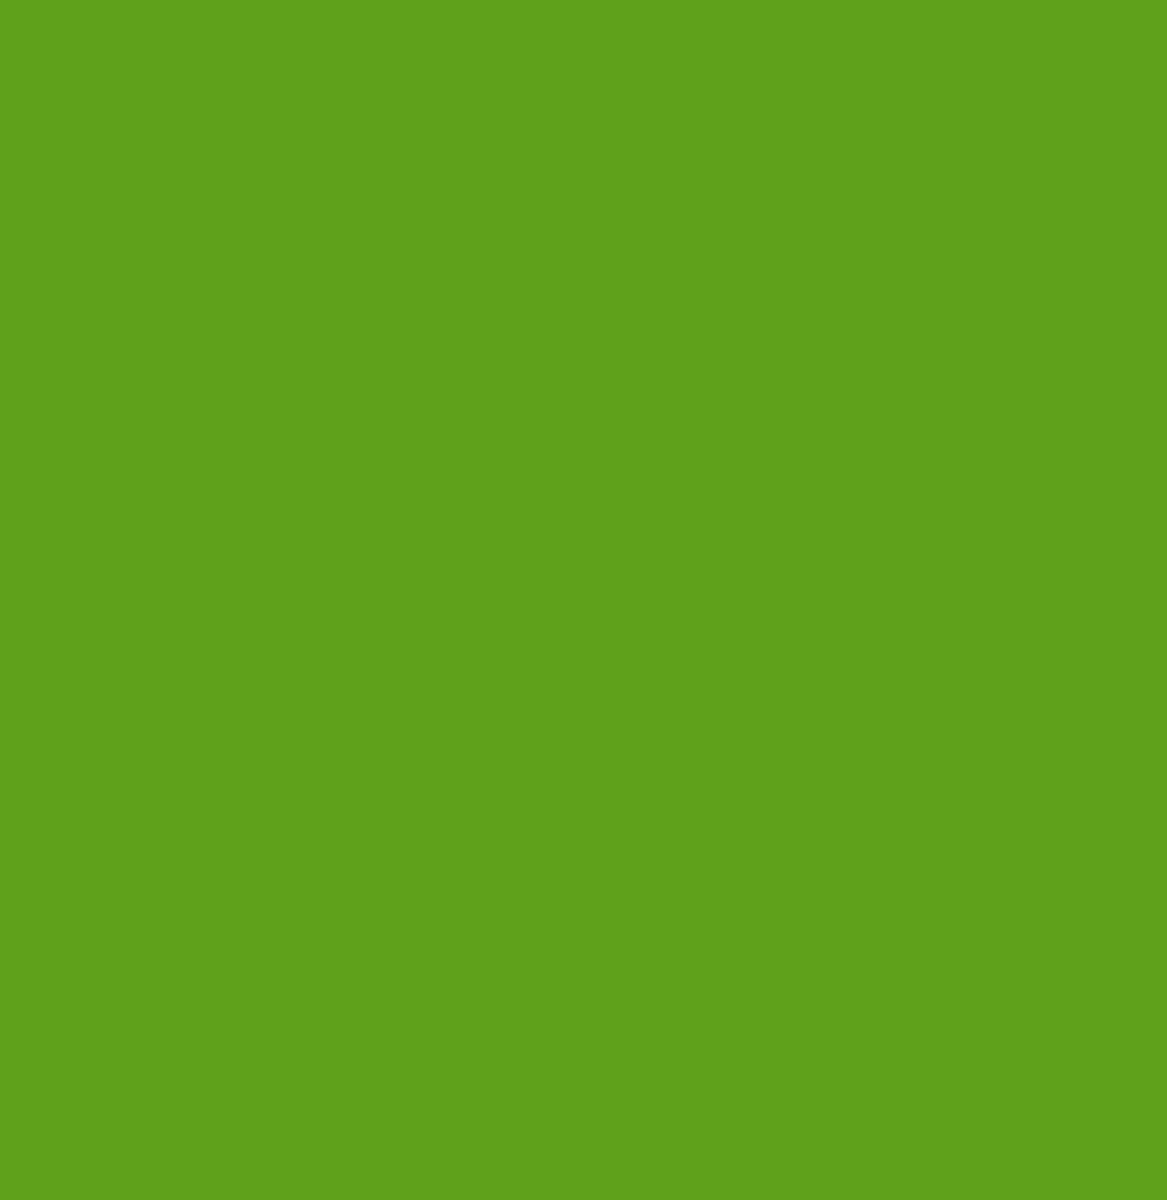 APPLE GREEN 100 SHEET PACK A4 DALTON MANOR 80gm PAPER